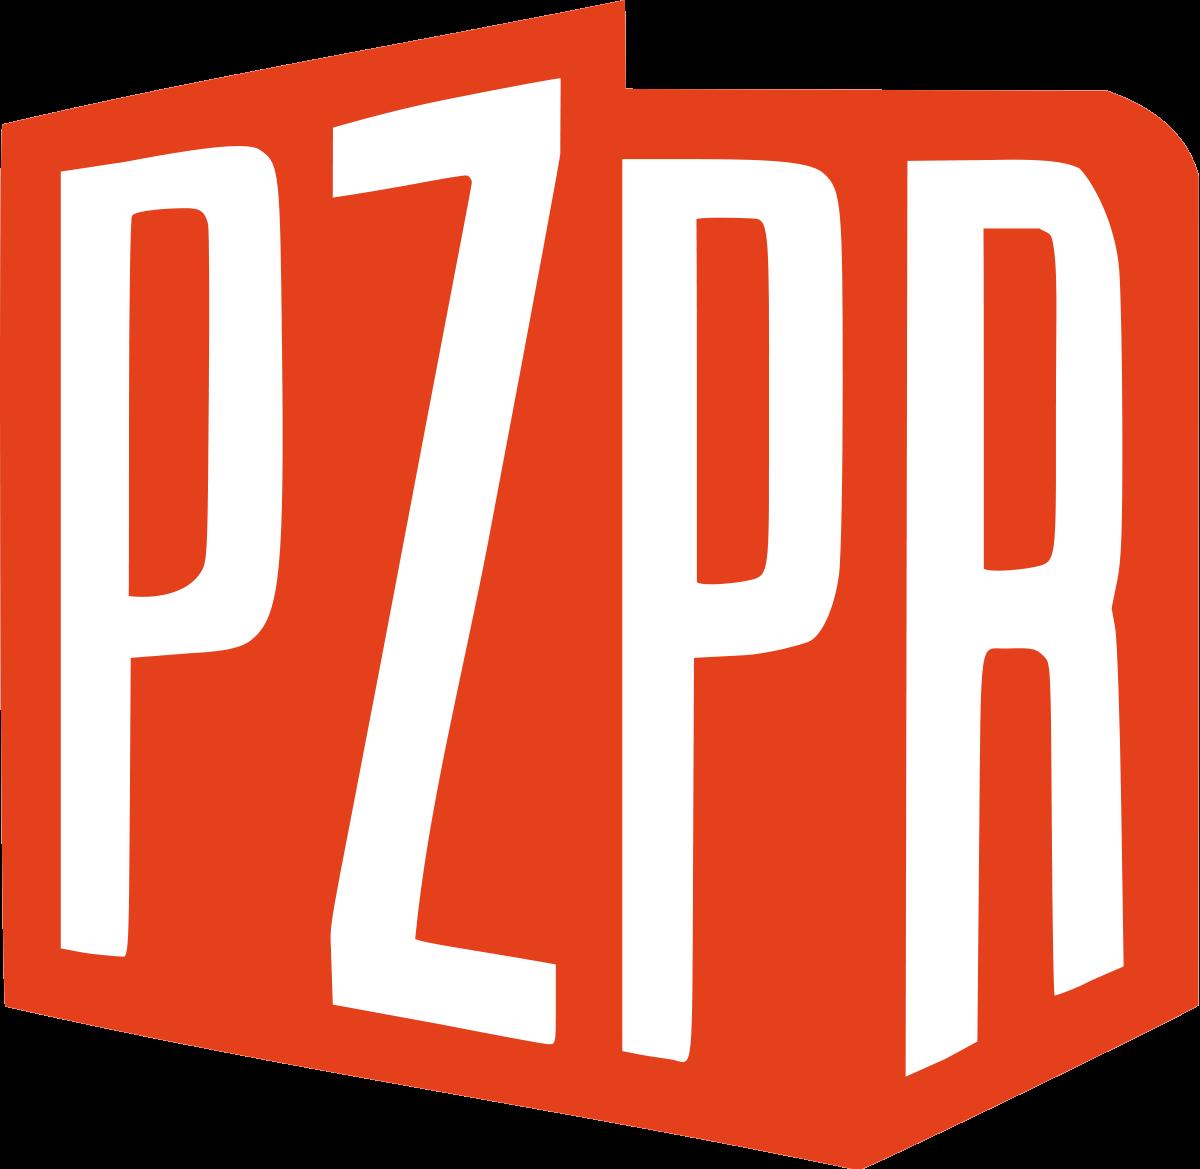 KC Polska Zjednoczona Partia Robotnicza